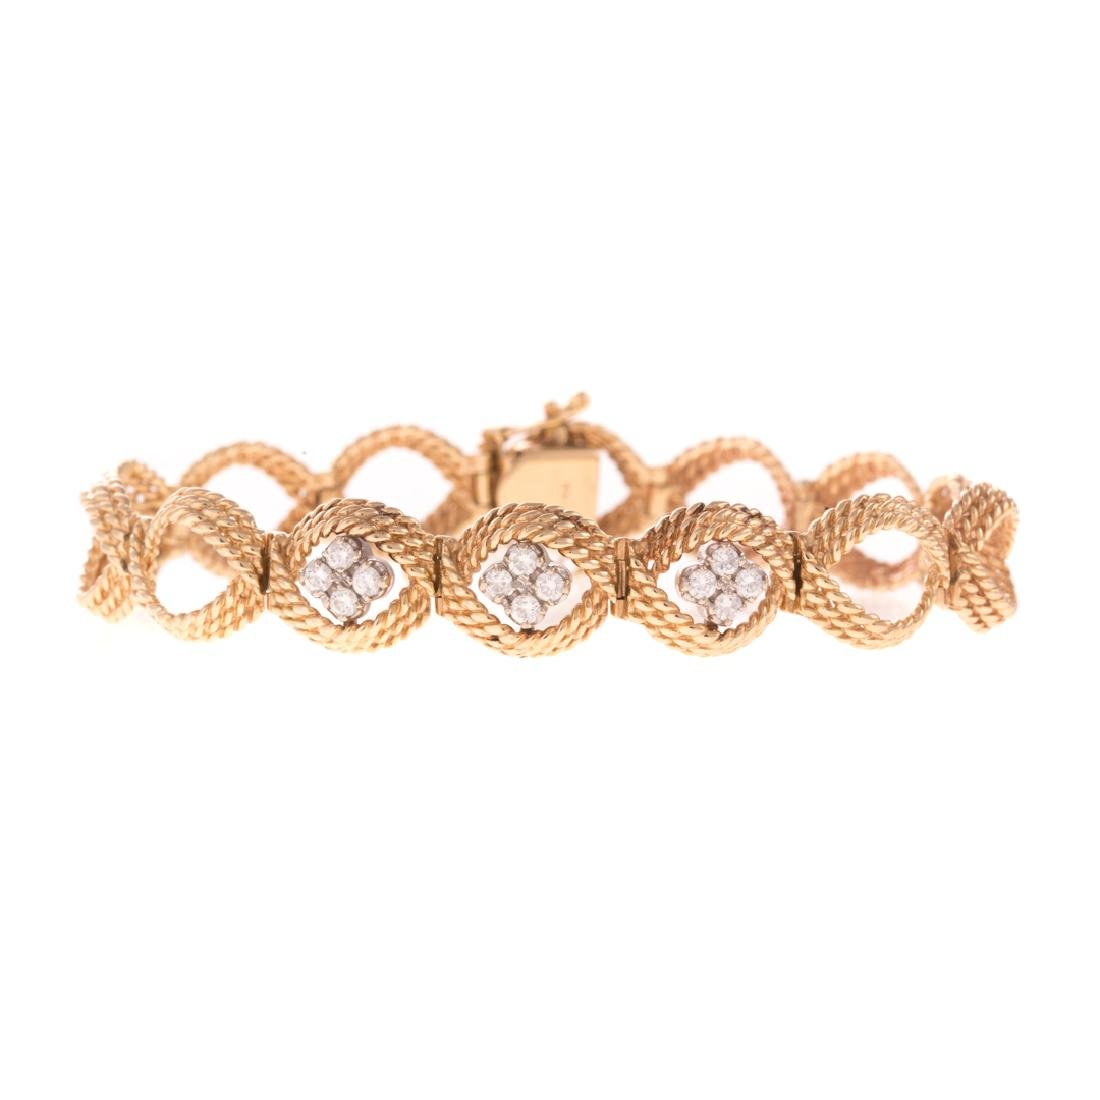 A Lady's Rope Link & Diamond Bracelet in 14K